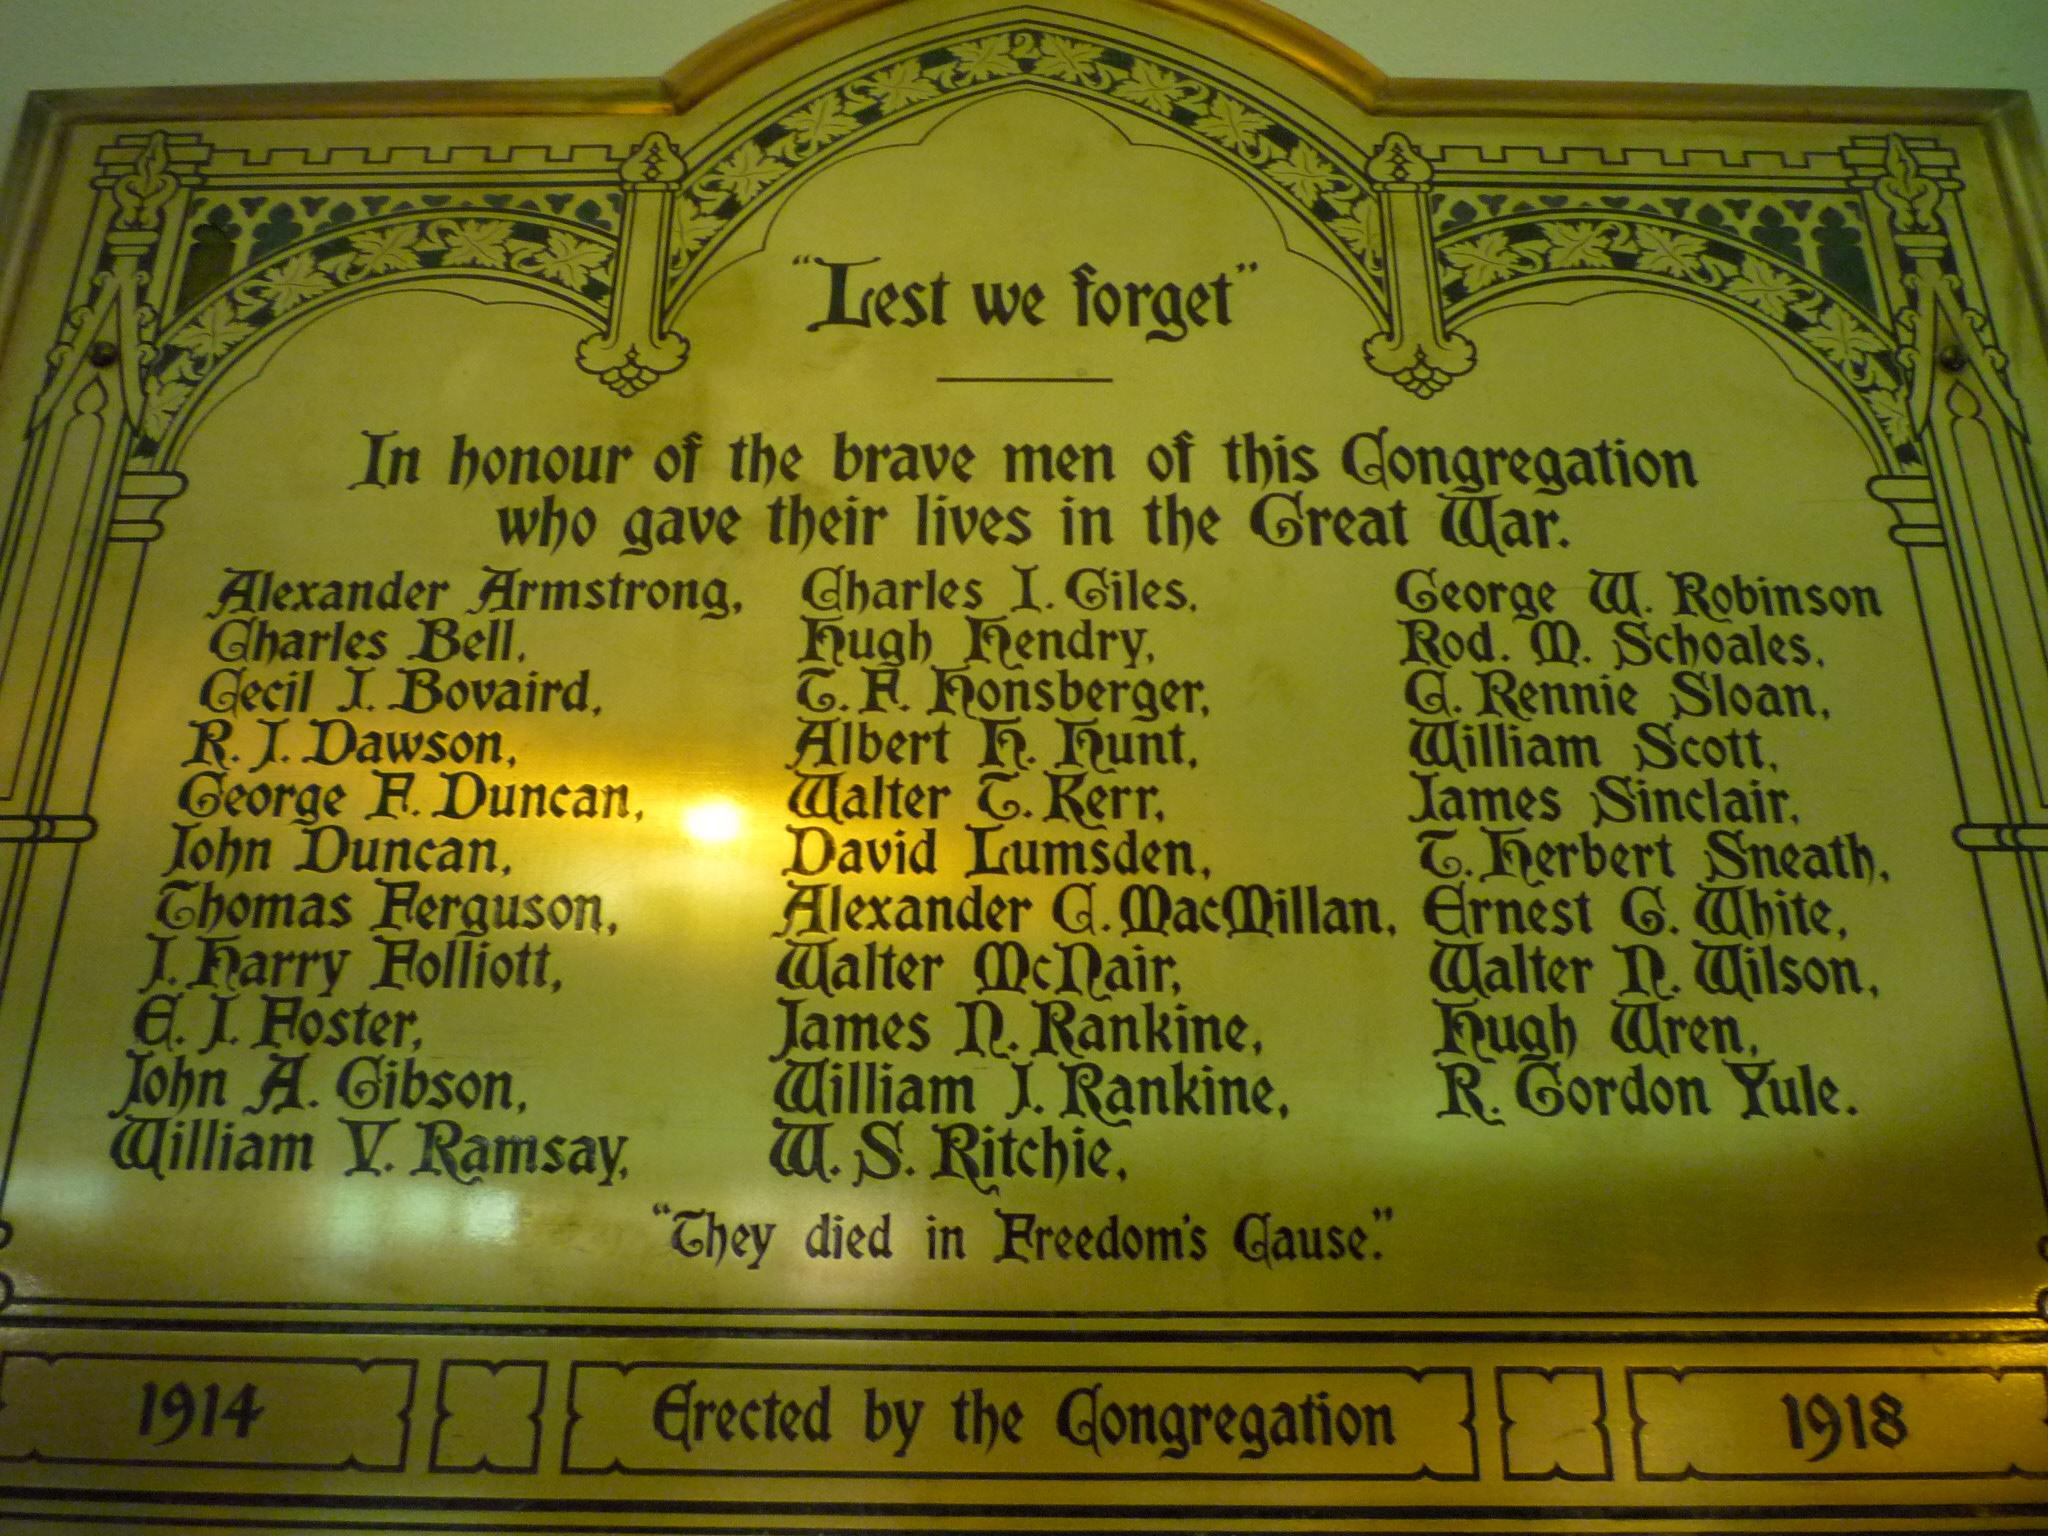 Memorial Plaque– Commemorative Plaque erected in the sanctuary of St. John's Presbyterian Church, Broadview Avenue, Toronto, Ontario. Canada.